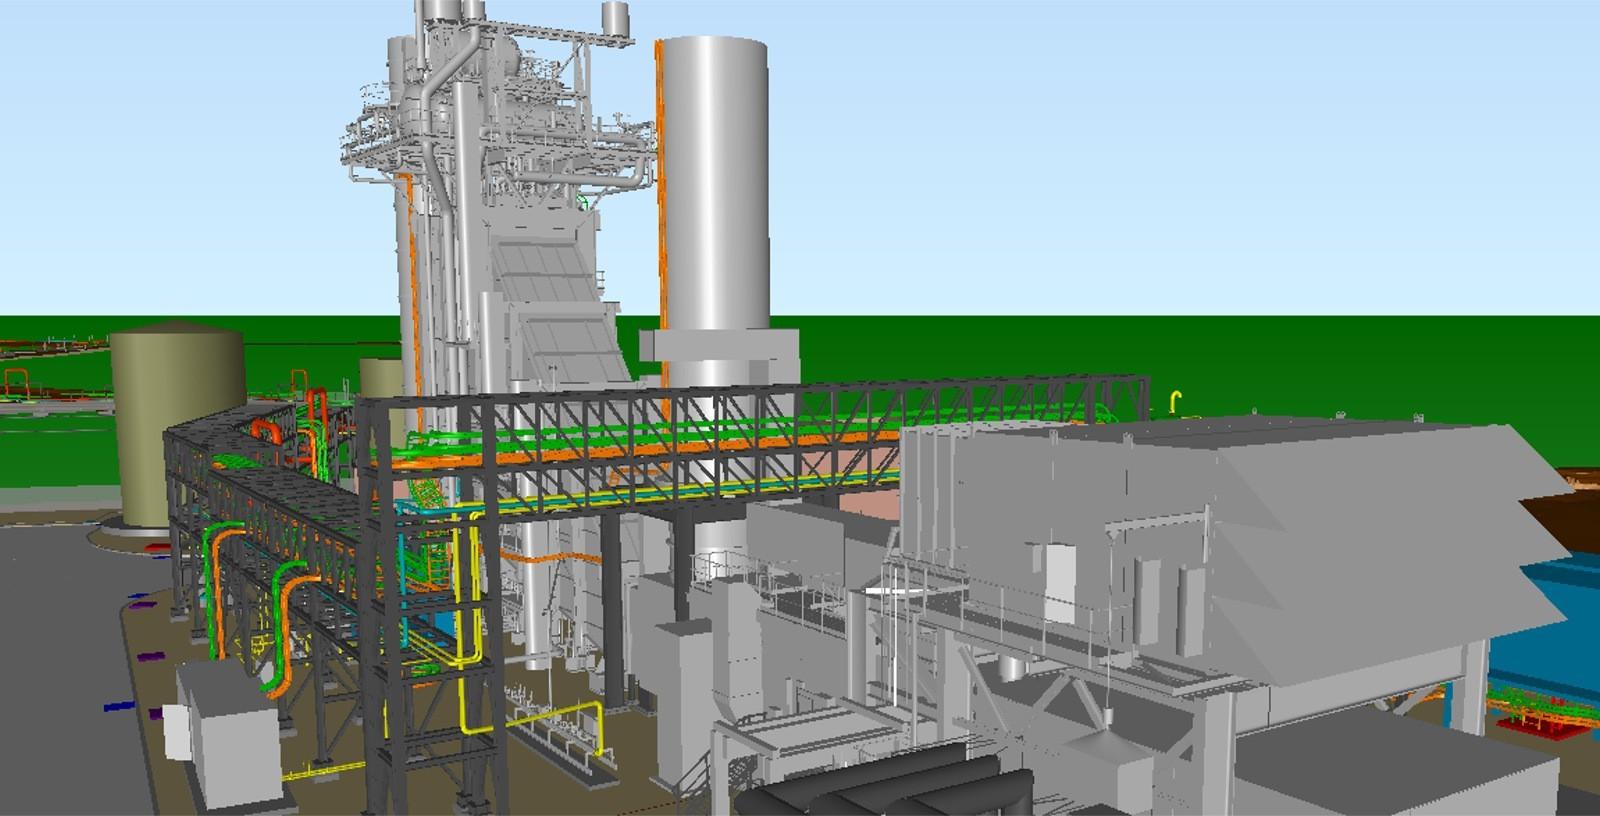 Aconcagua_Cogeneration_CCGT_Concon-Refinery_Duro-Felguera_IDOM_3